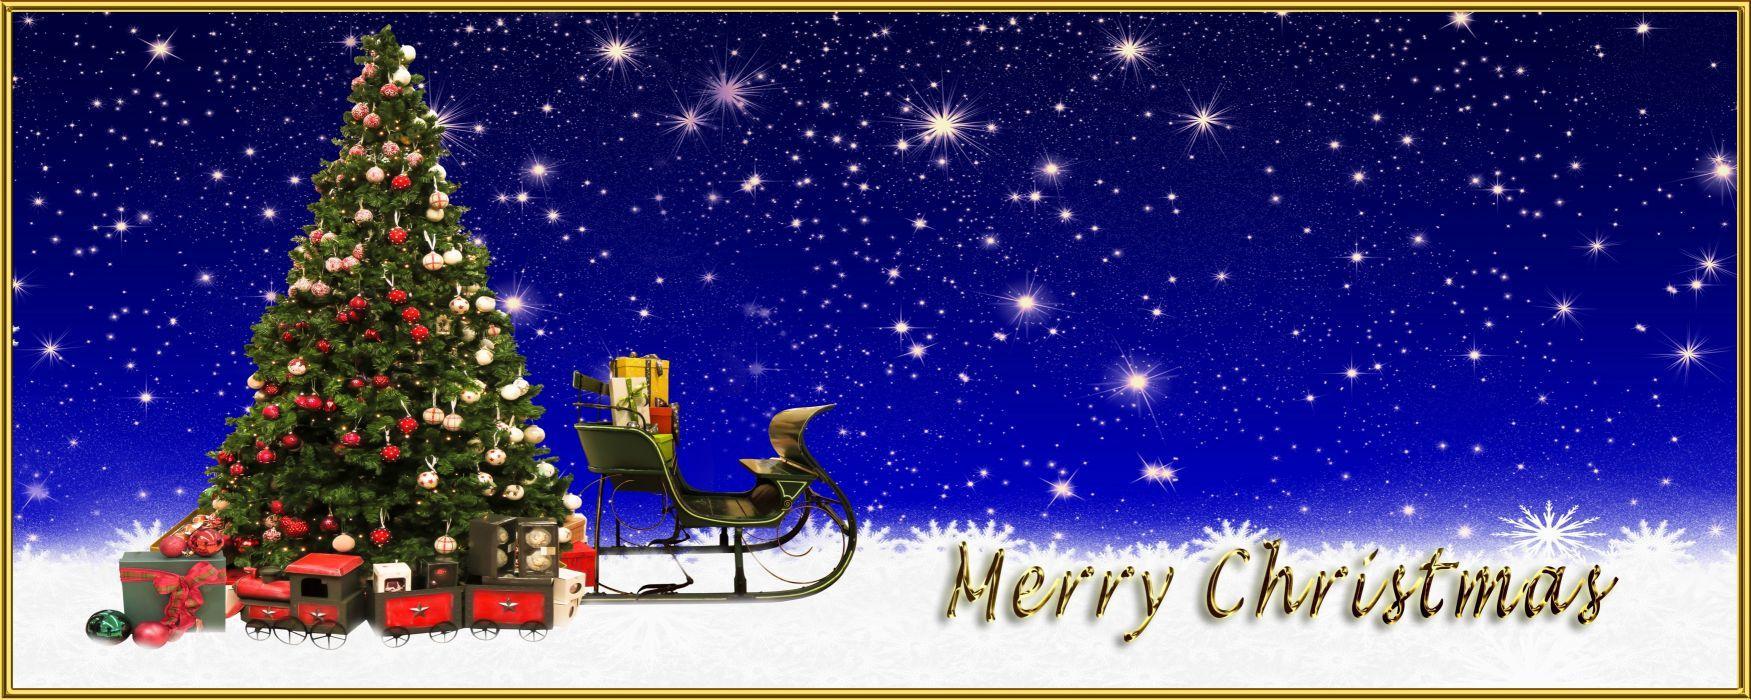 Christmas Merry Christmas Greeting Card wallpaper